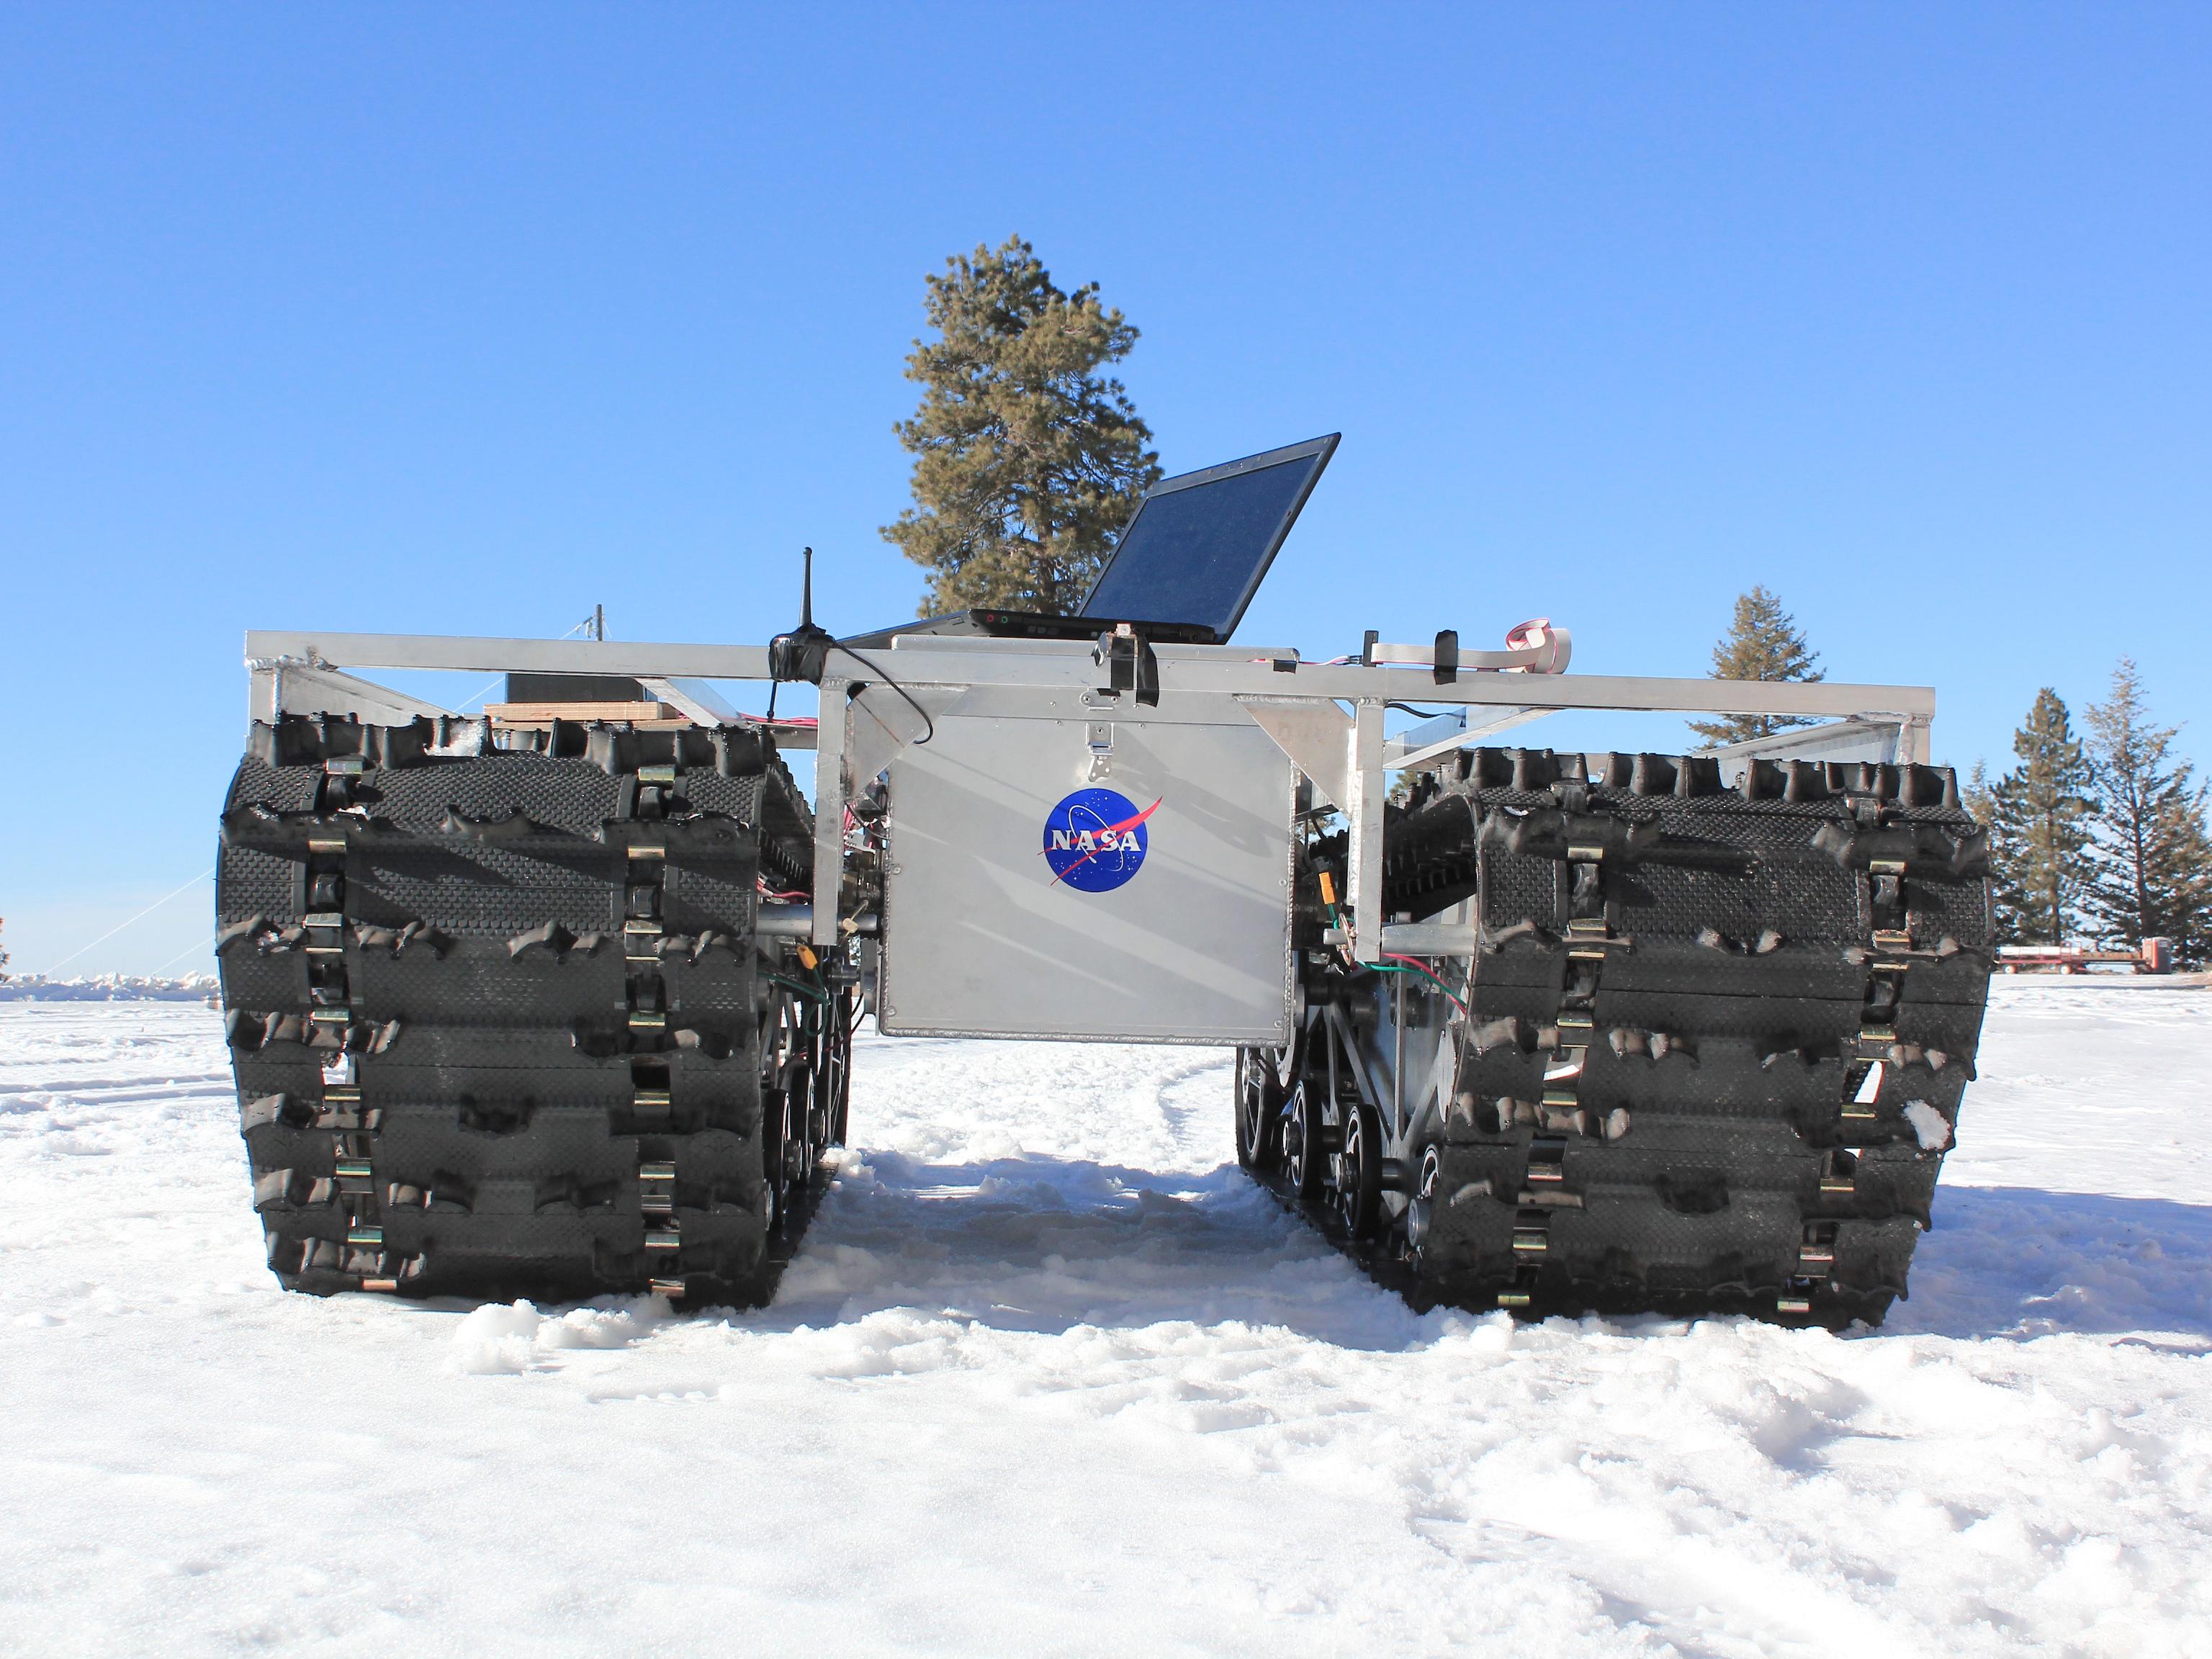 mars rover greenland - photo #3